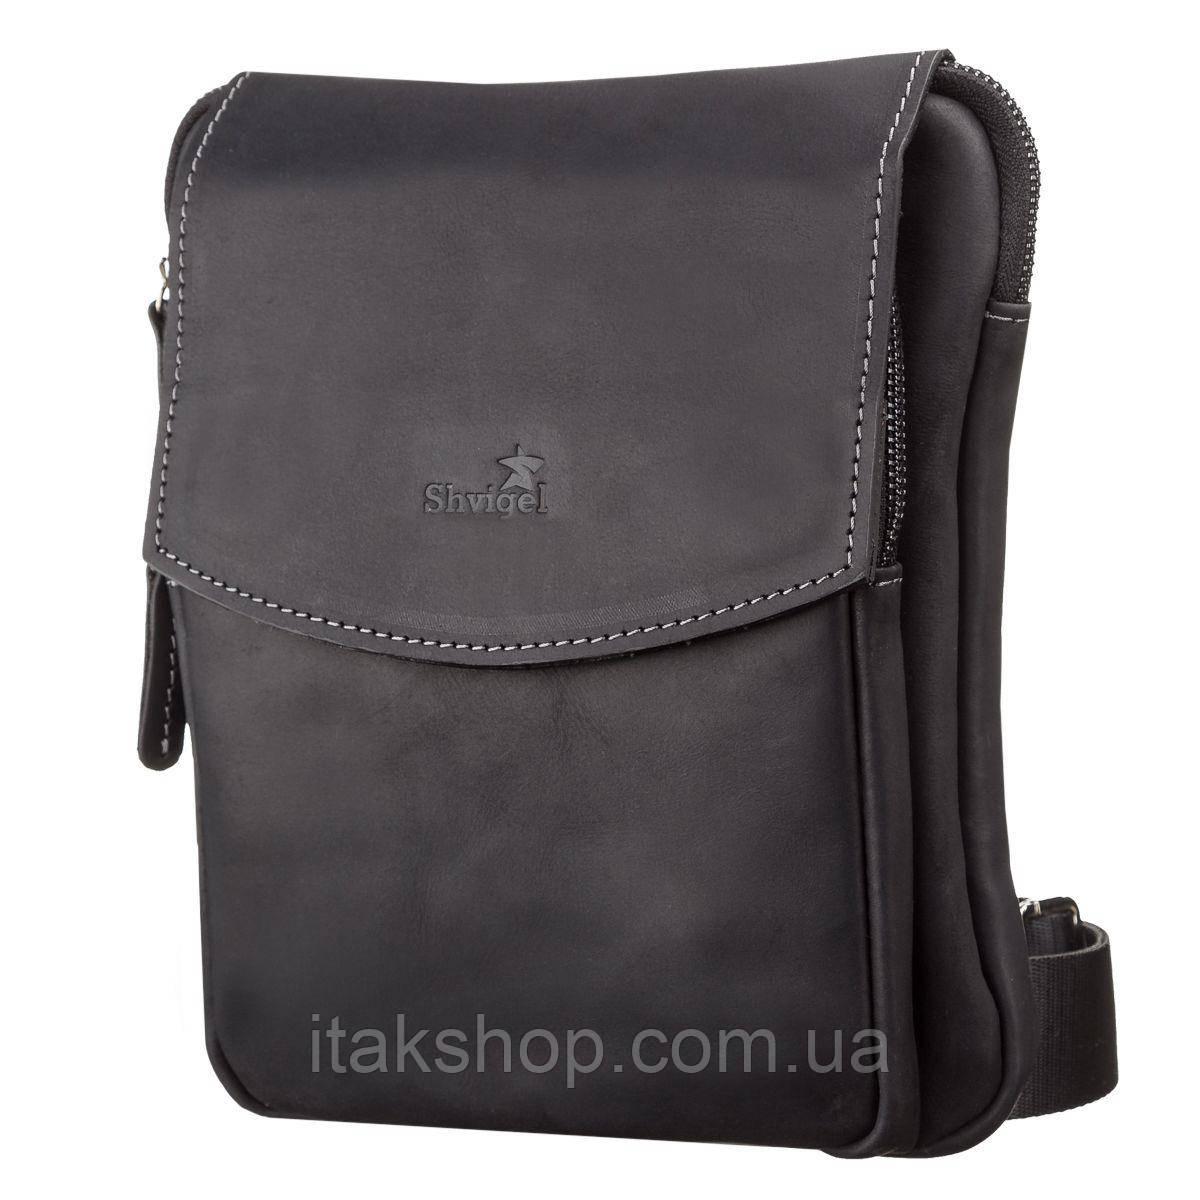 Мужская кожаная сумка Shvigel Черная